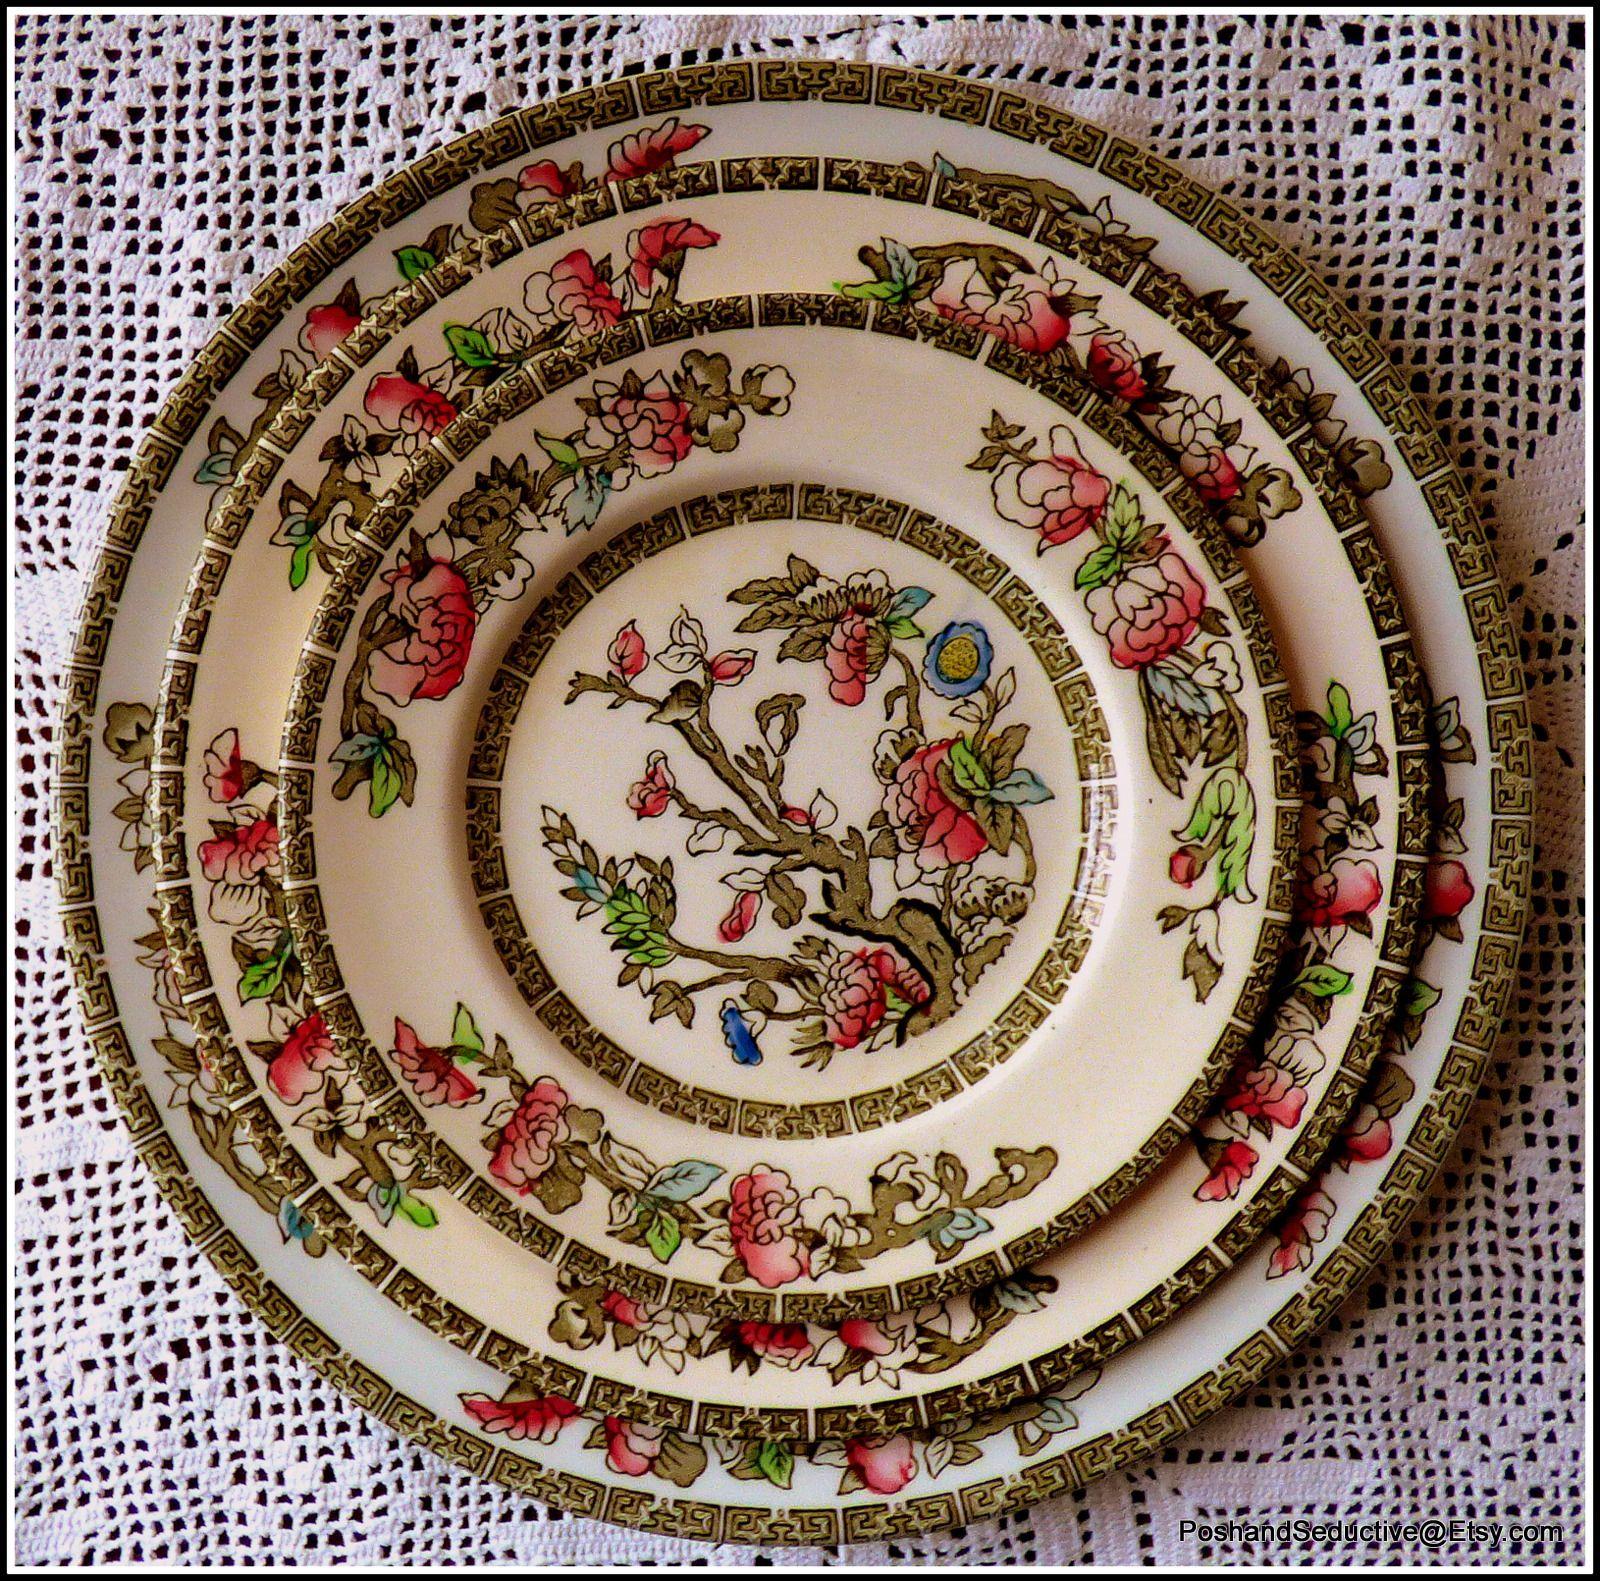 Famous China Patterns johnson brothers' famous indian tree pattern plates circa 1940